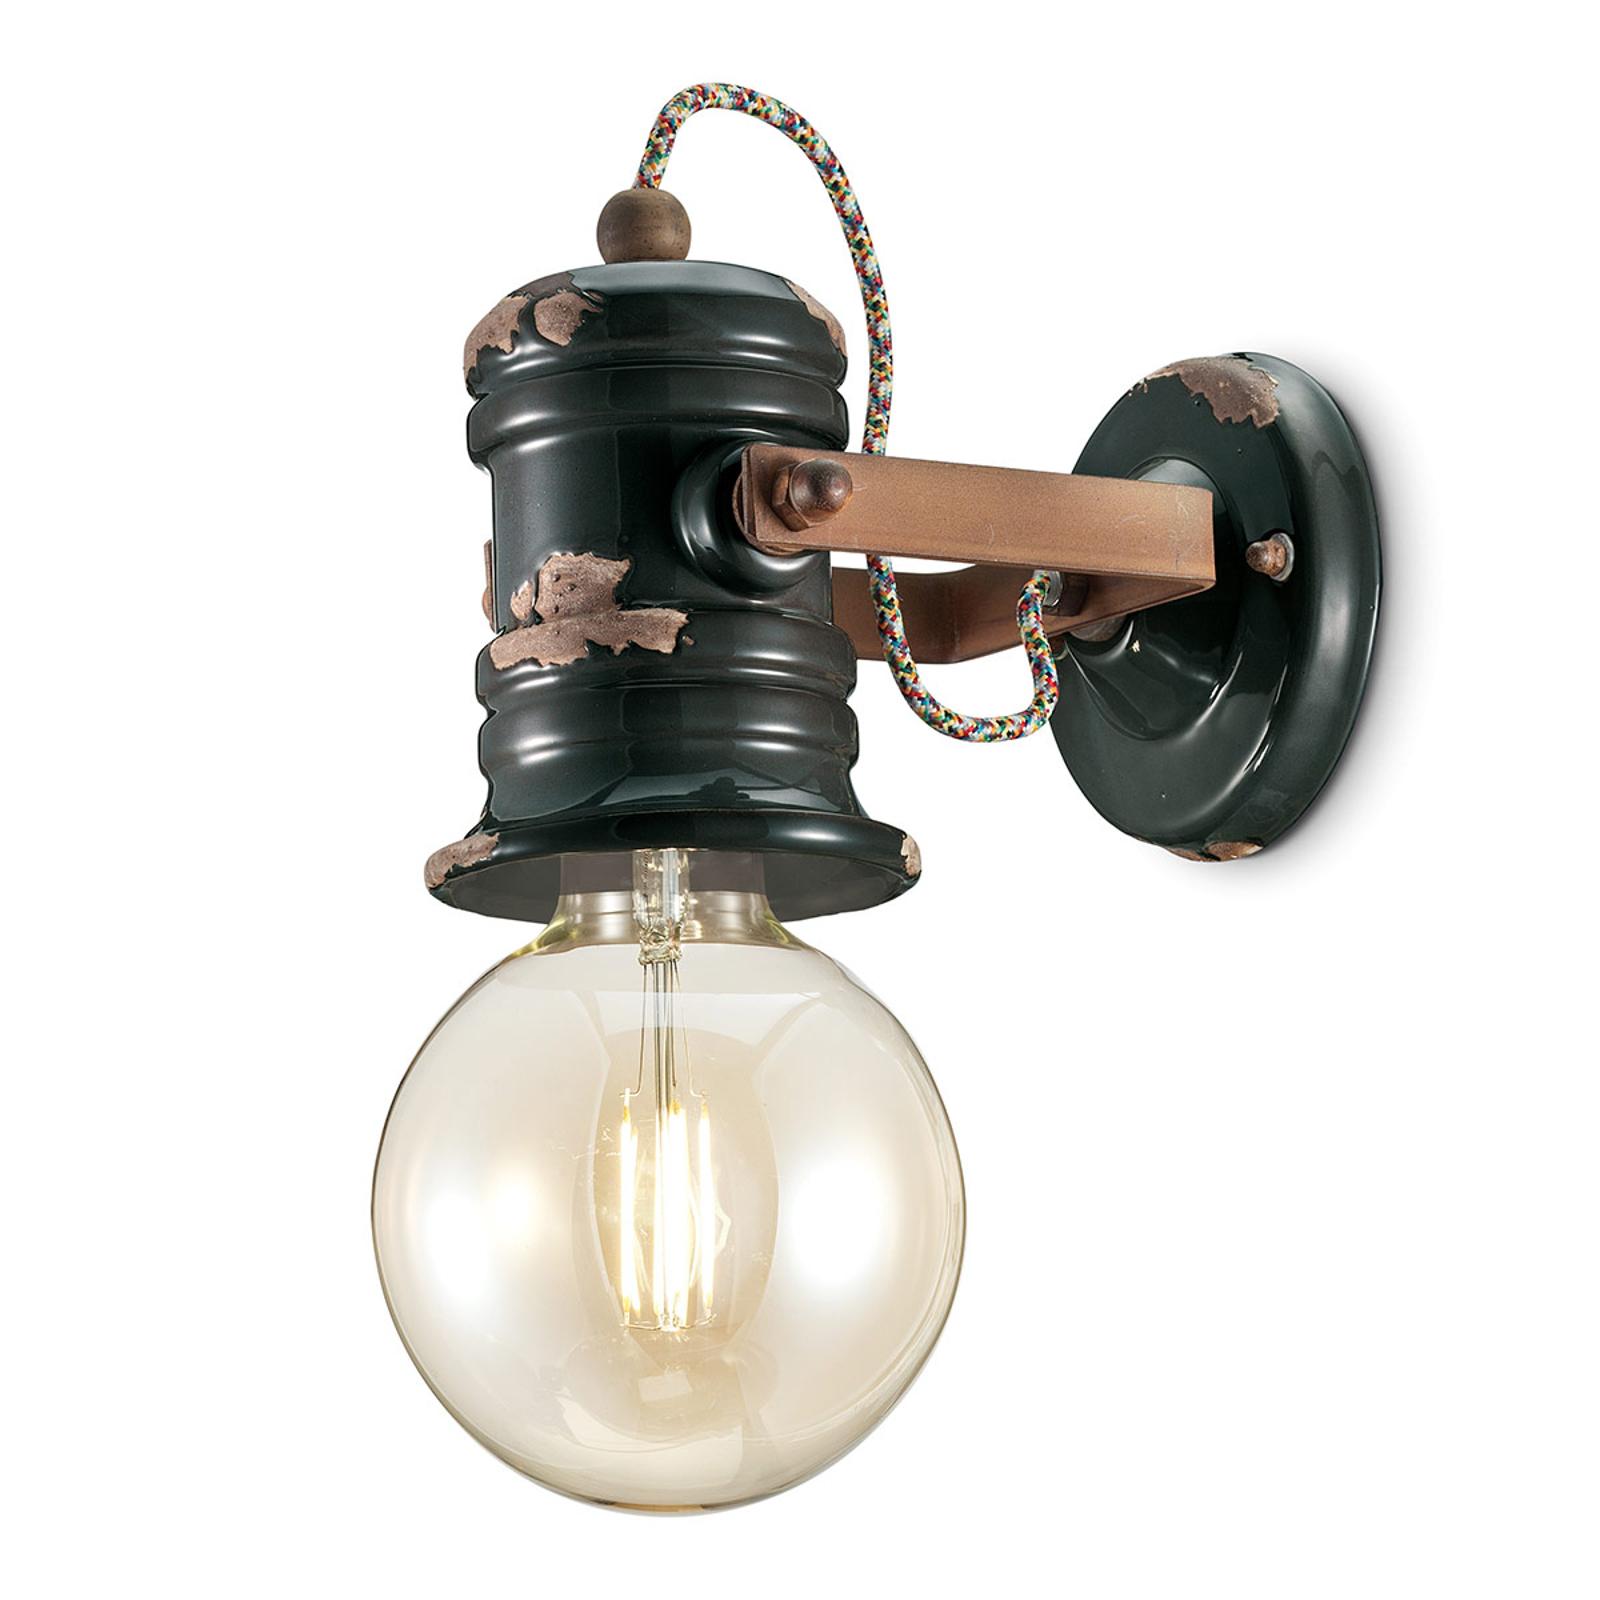 Vägglampa C1843 i vintage-design svart